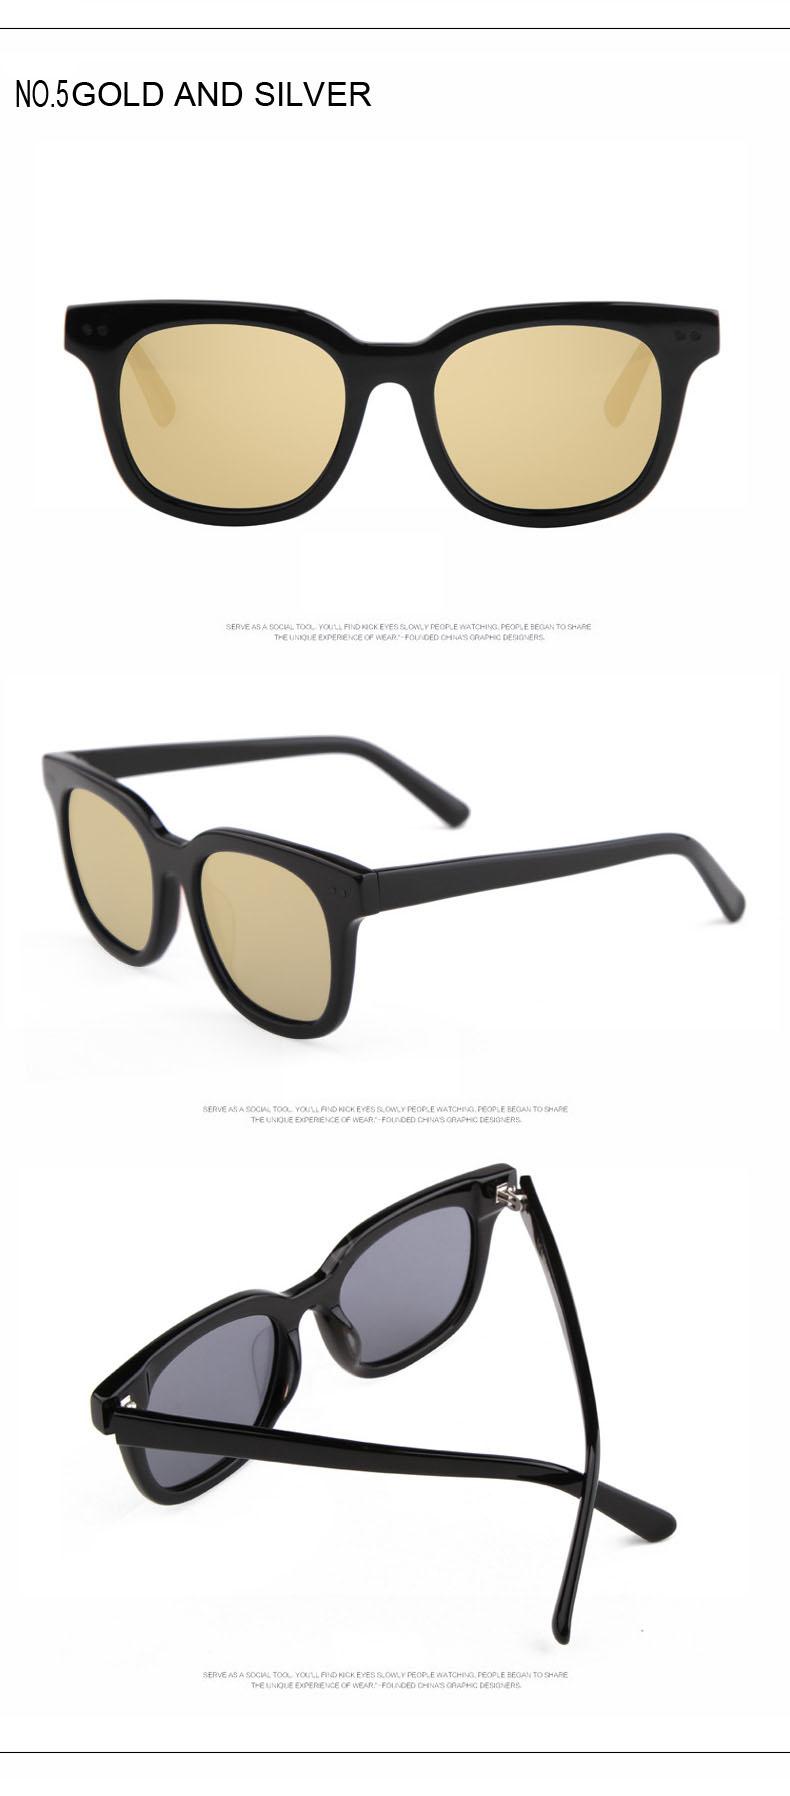 Vintage Glasses sunglasses Stop118 7